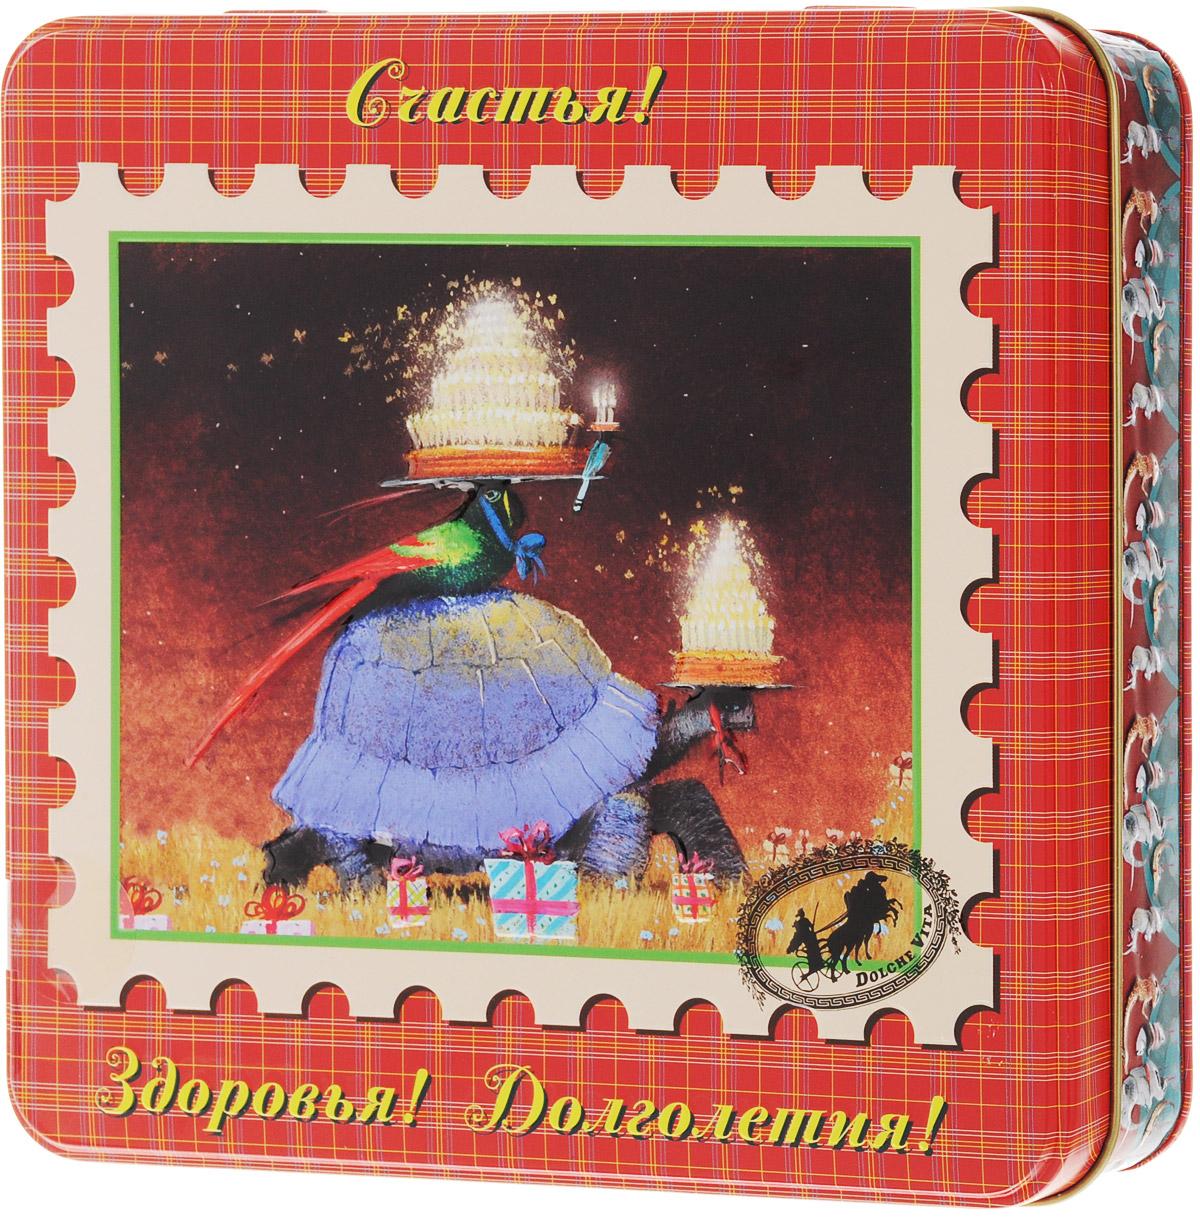 Dolche Vita Черепаха подарочный набор листового чая, 125 г цены онлайн